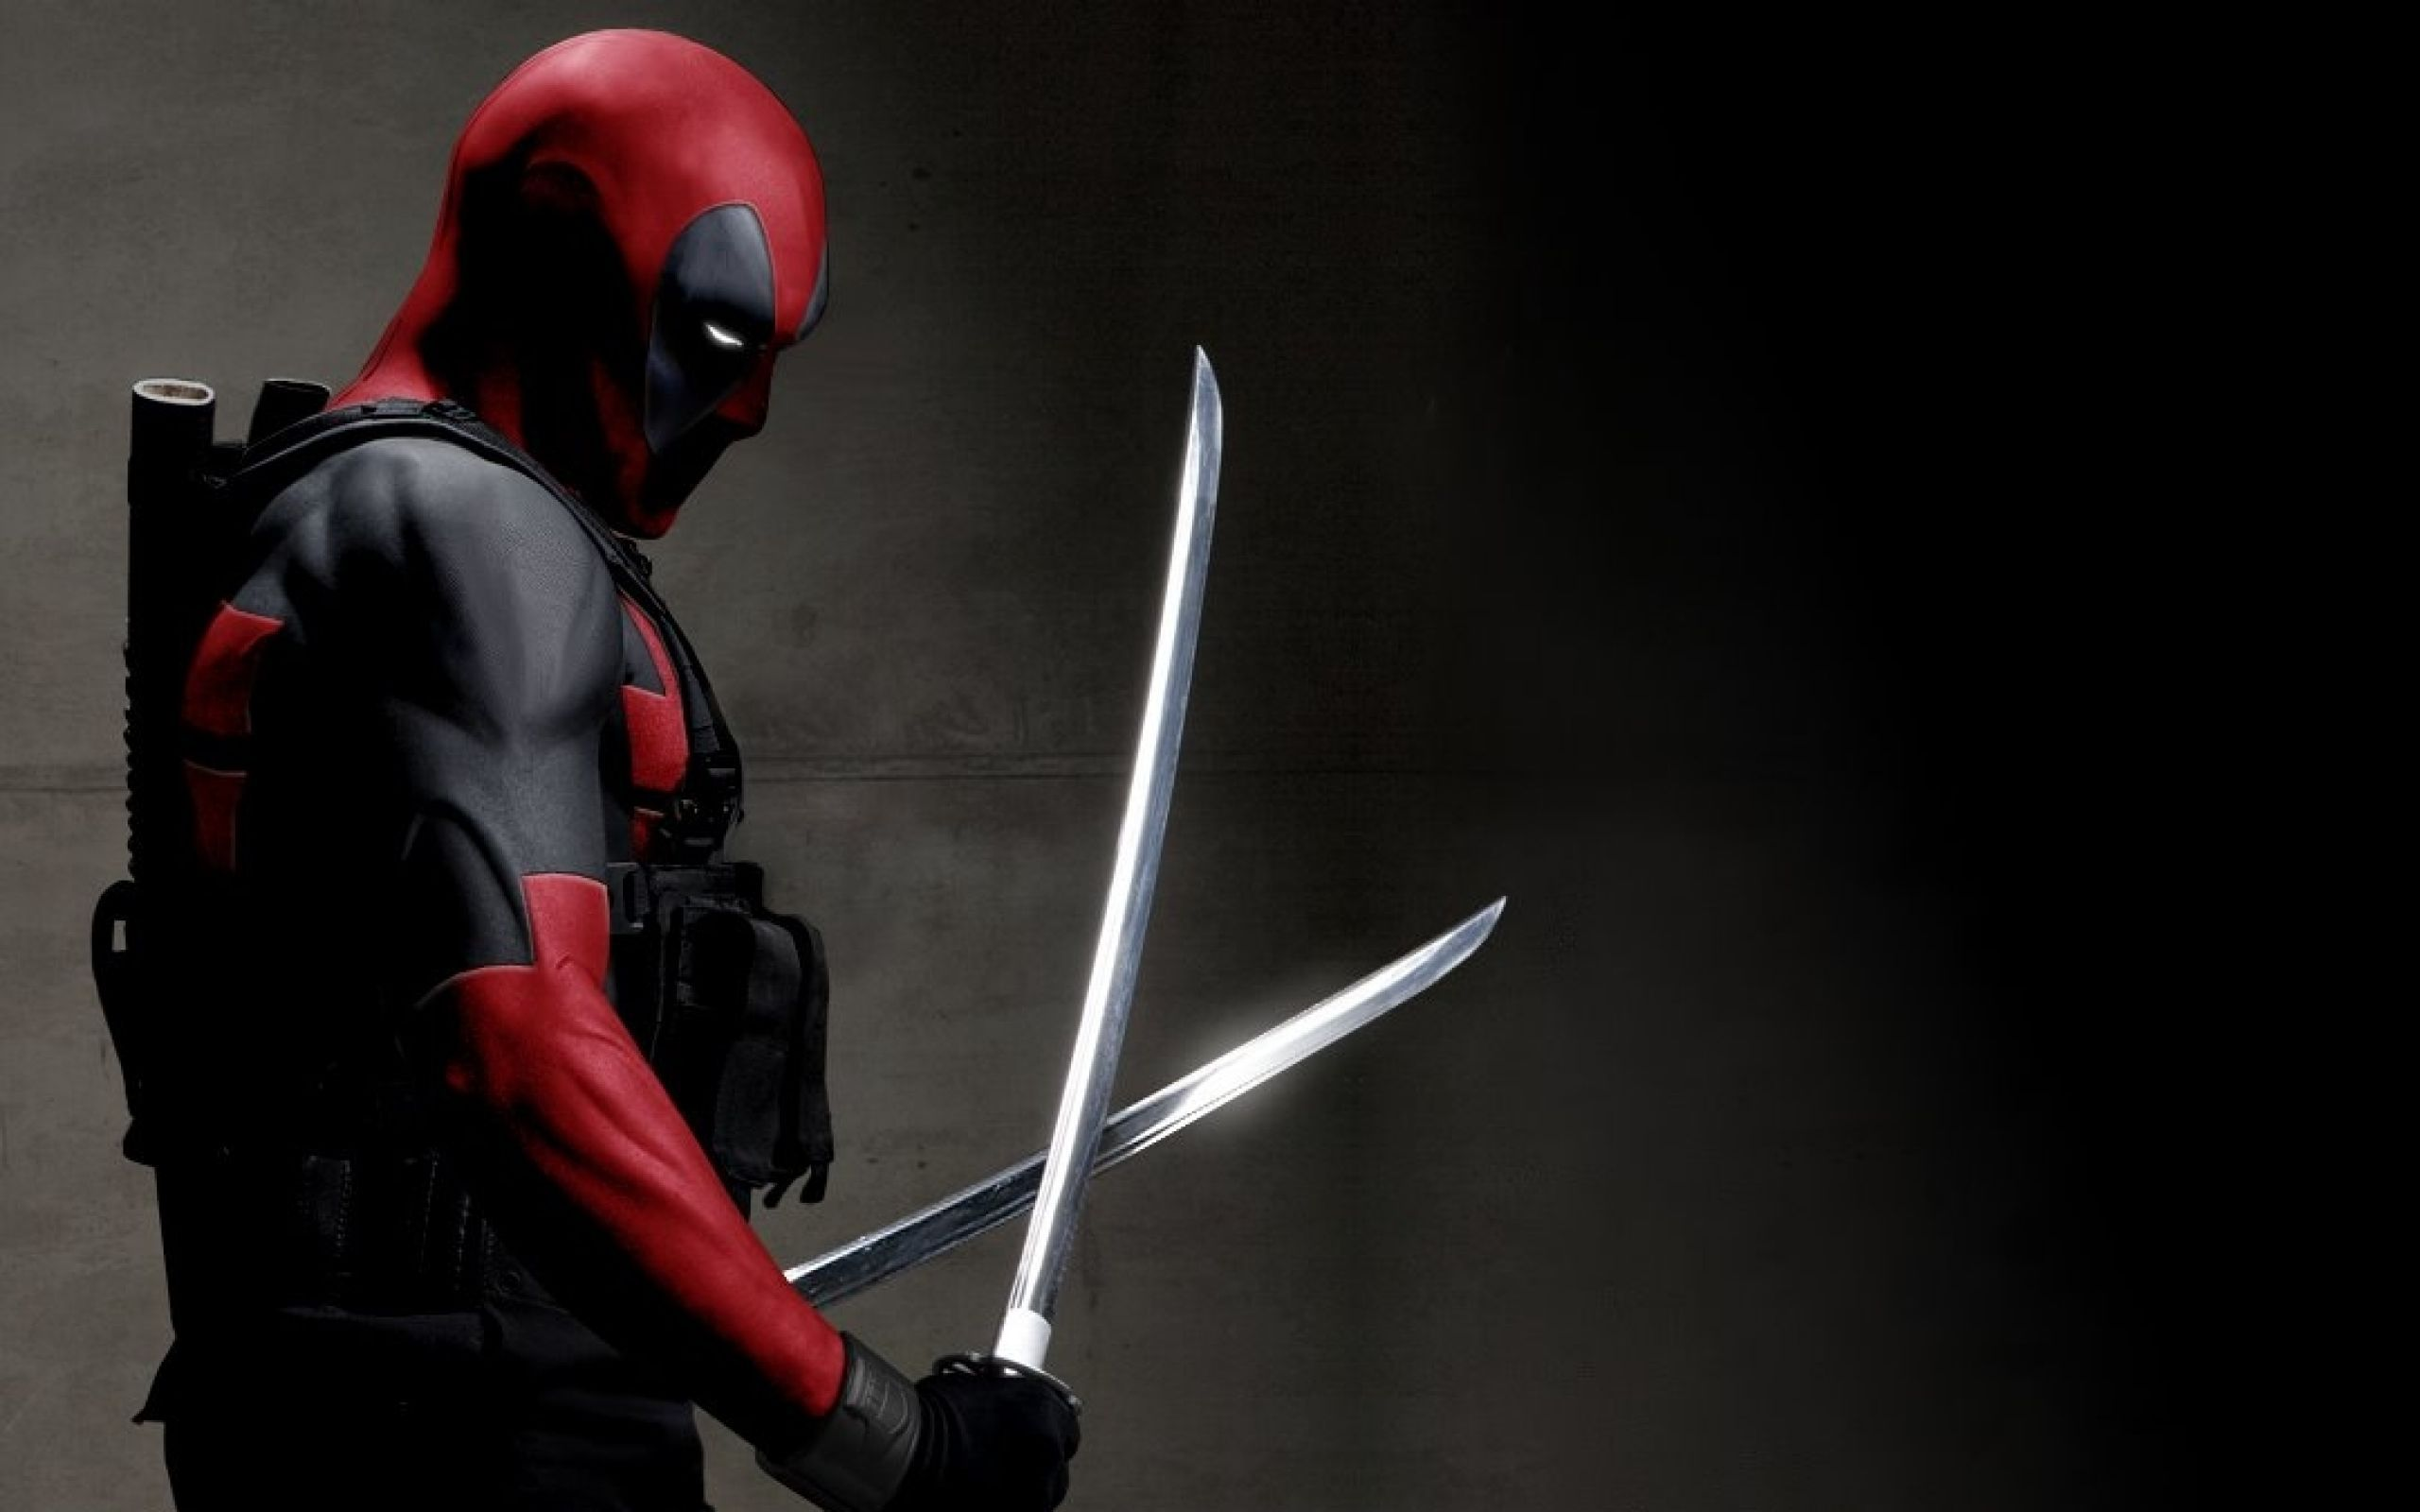 1000 Ideas About Deadpool Hd Wallpaper On Pinterest: Deadpool Wallpapers Best Wallpapers